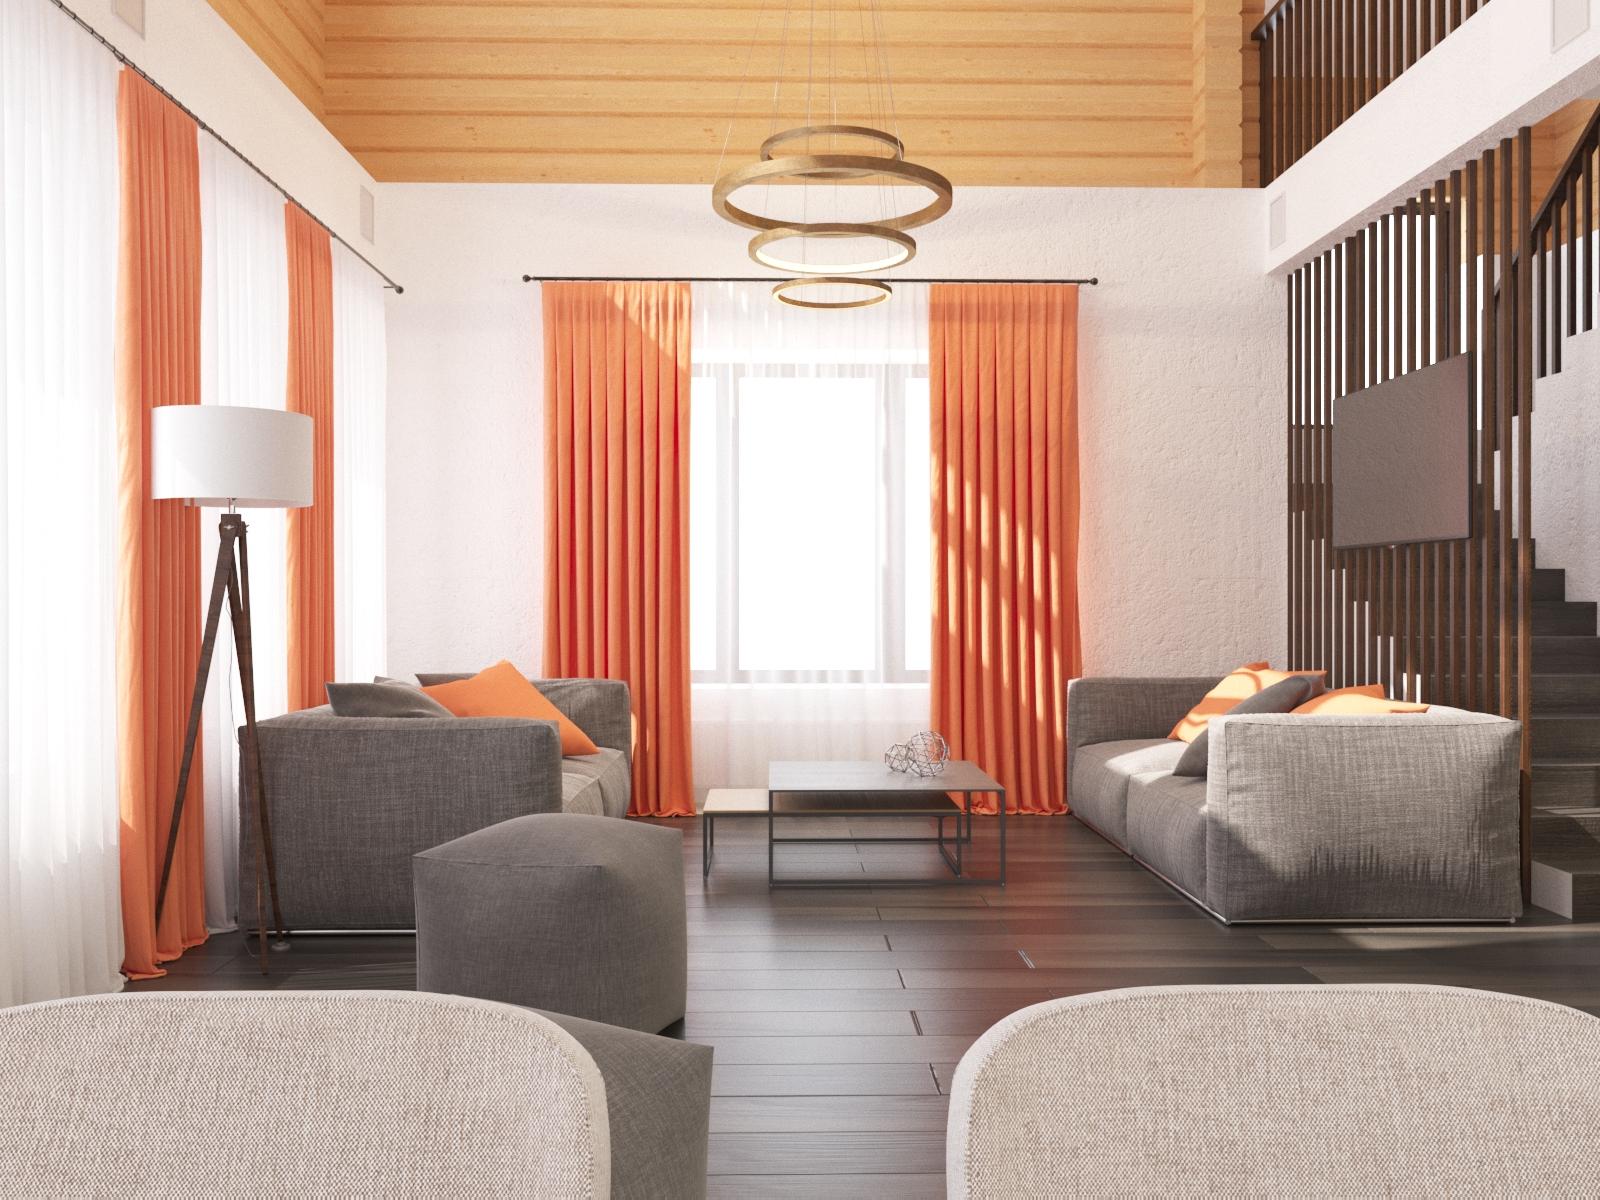 Дизайн и визуализация гостинной комнаты частного дома. фото f_9805f4784f07159f.jpg